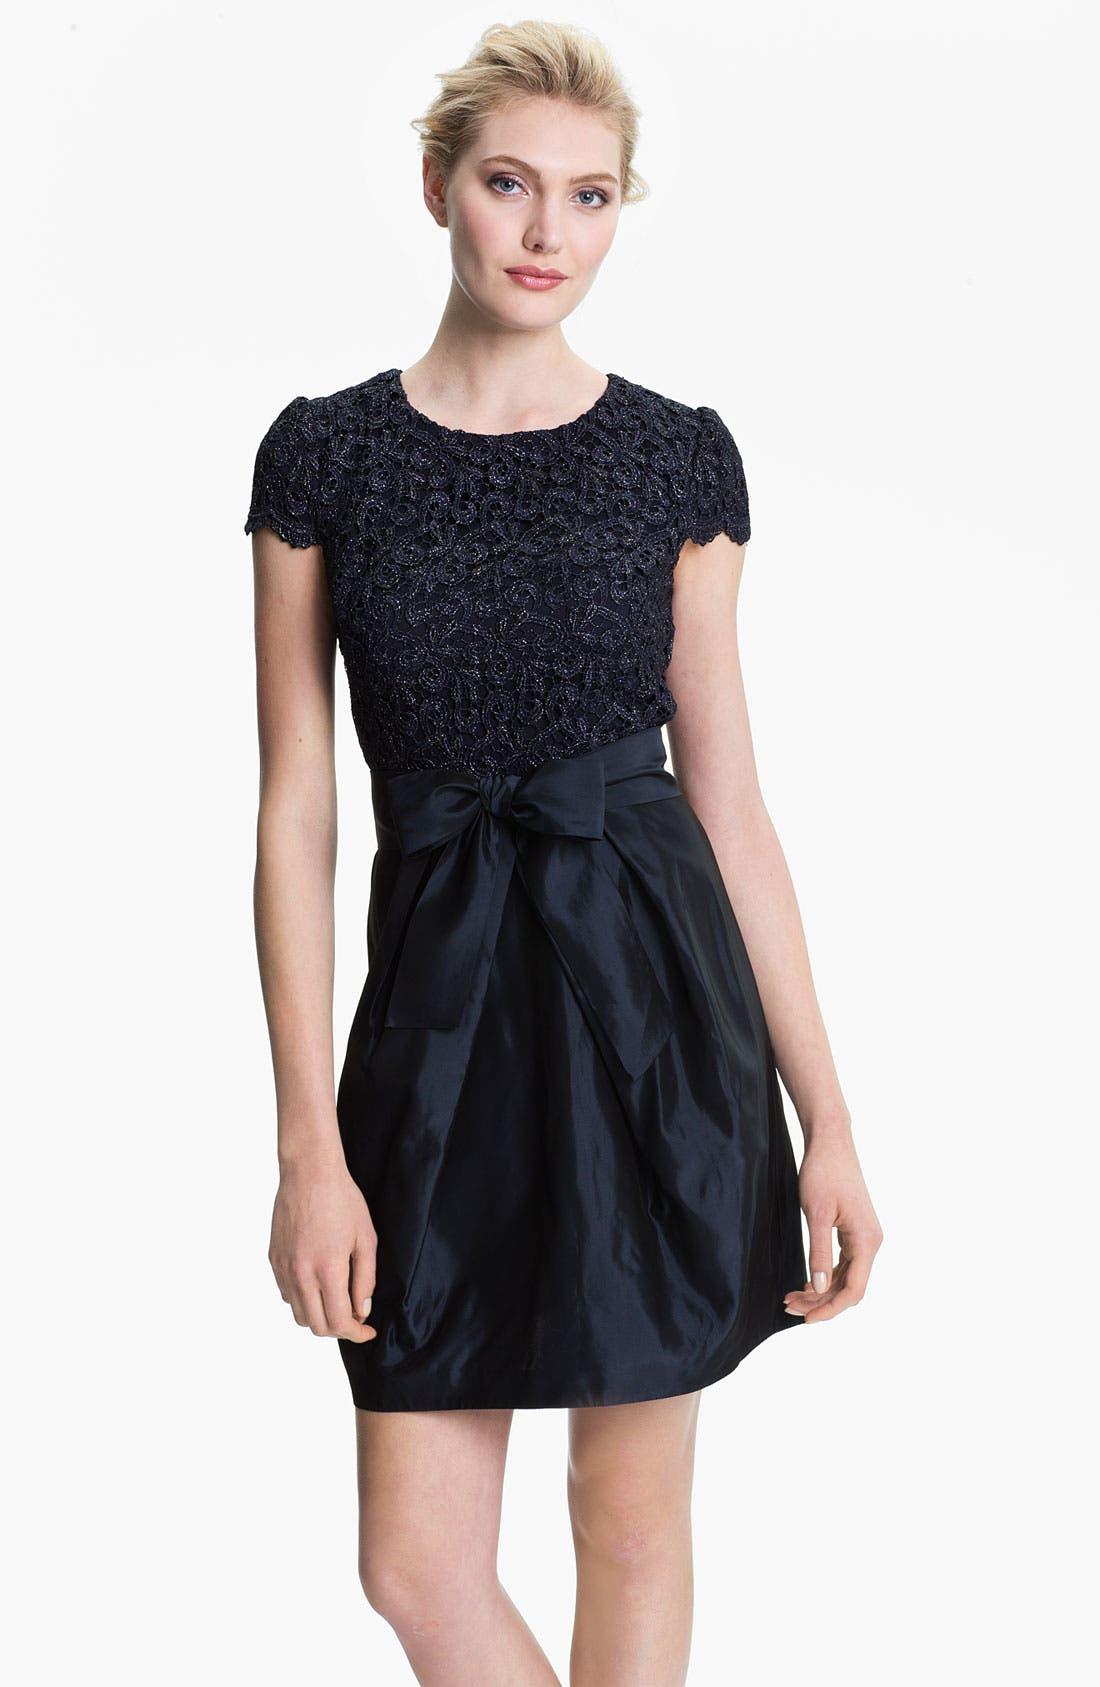 Alternate Image 1 Selected - Suzi Chin for Maggy Boutique Lace & Taffeta Dress (Petite)